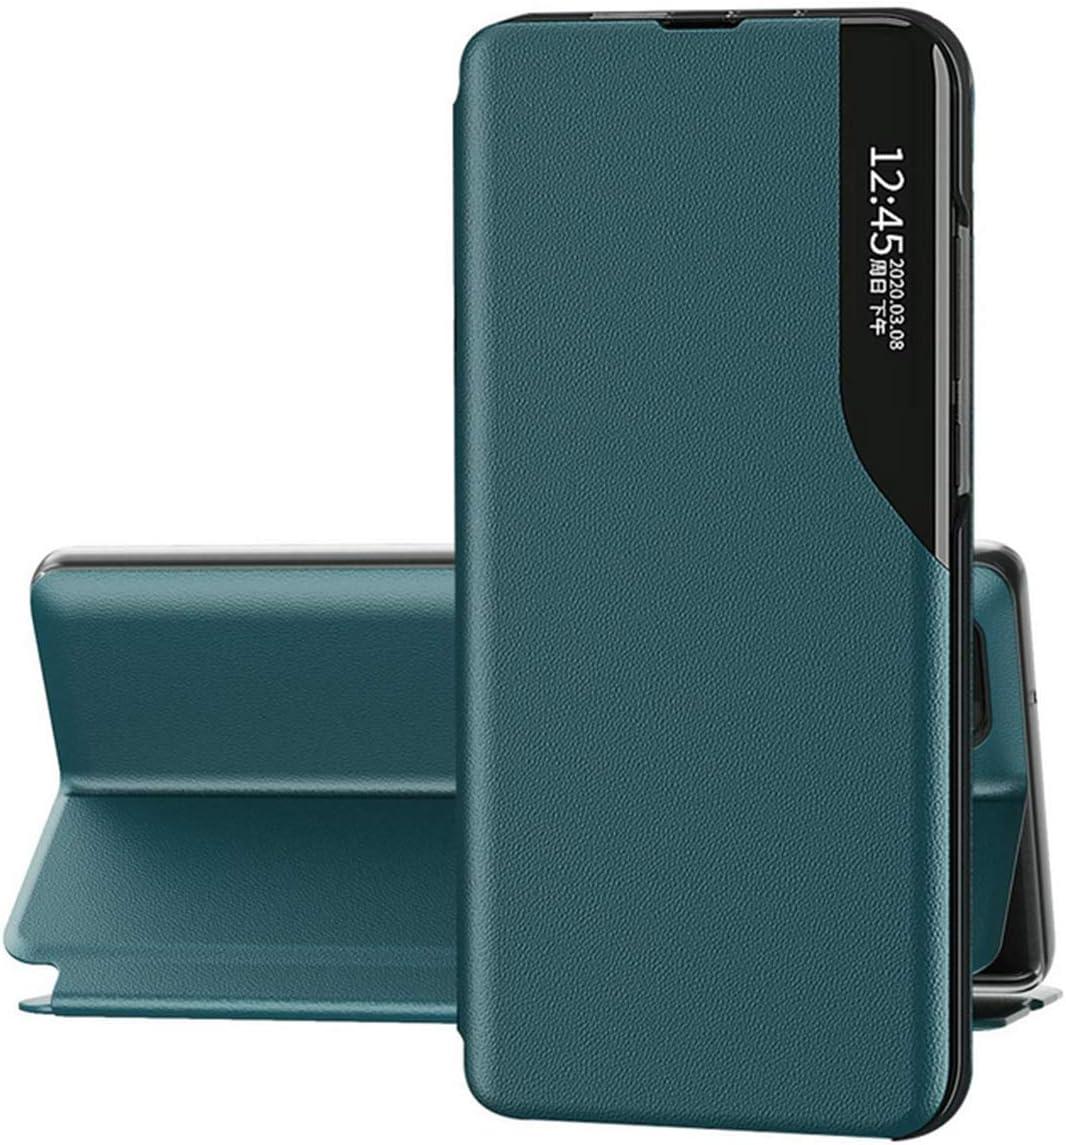 غطاء TAMIA لهاتف Mate 40 Mate 40 Pro Case Mate 40 Mate 40 Pro مقاوم للماء غطاء حماية أسود لطيف (Huawei Mate 40، أخضر)